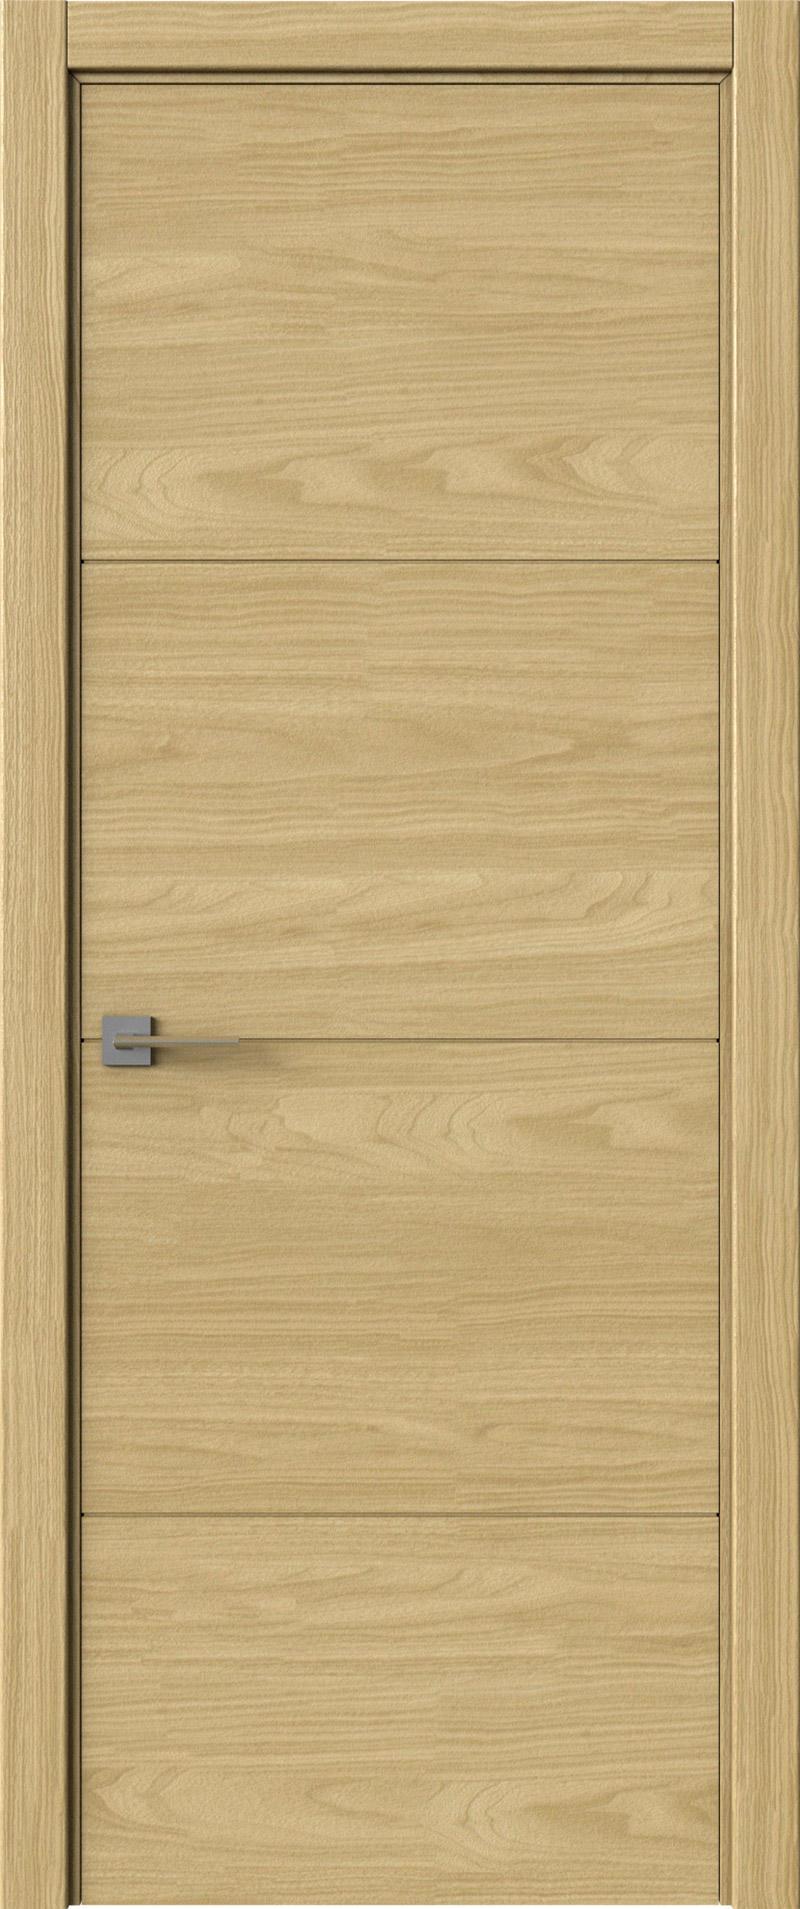 Tivoli Г-2 цвет - Дуб нордик Без стекла (ДГ)